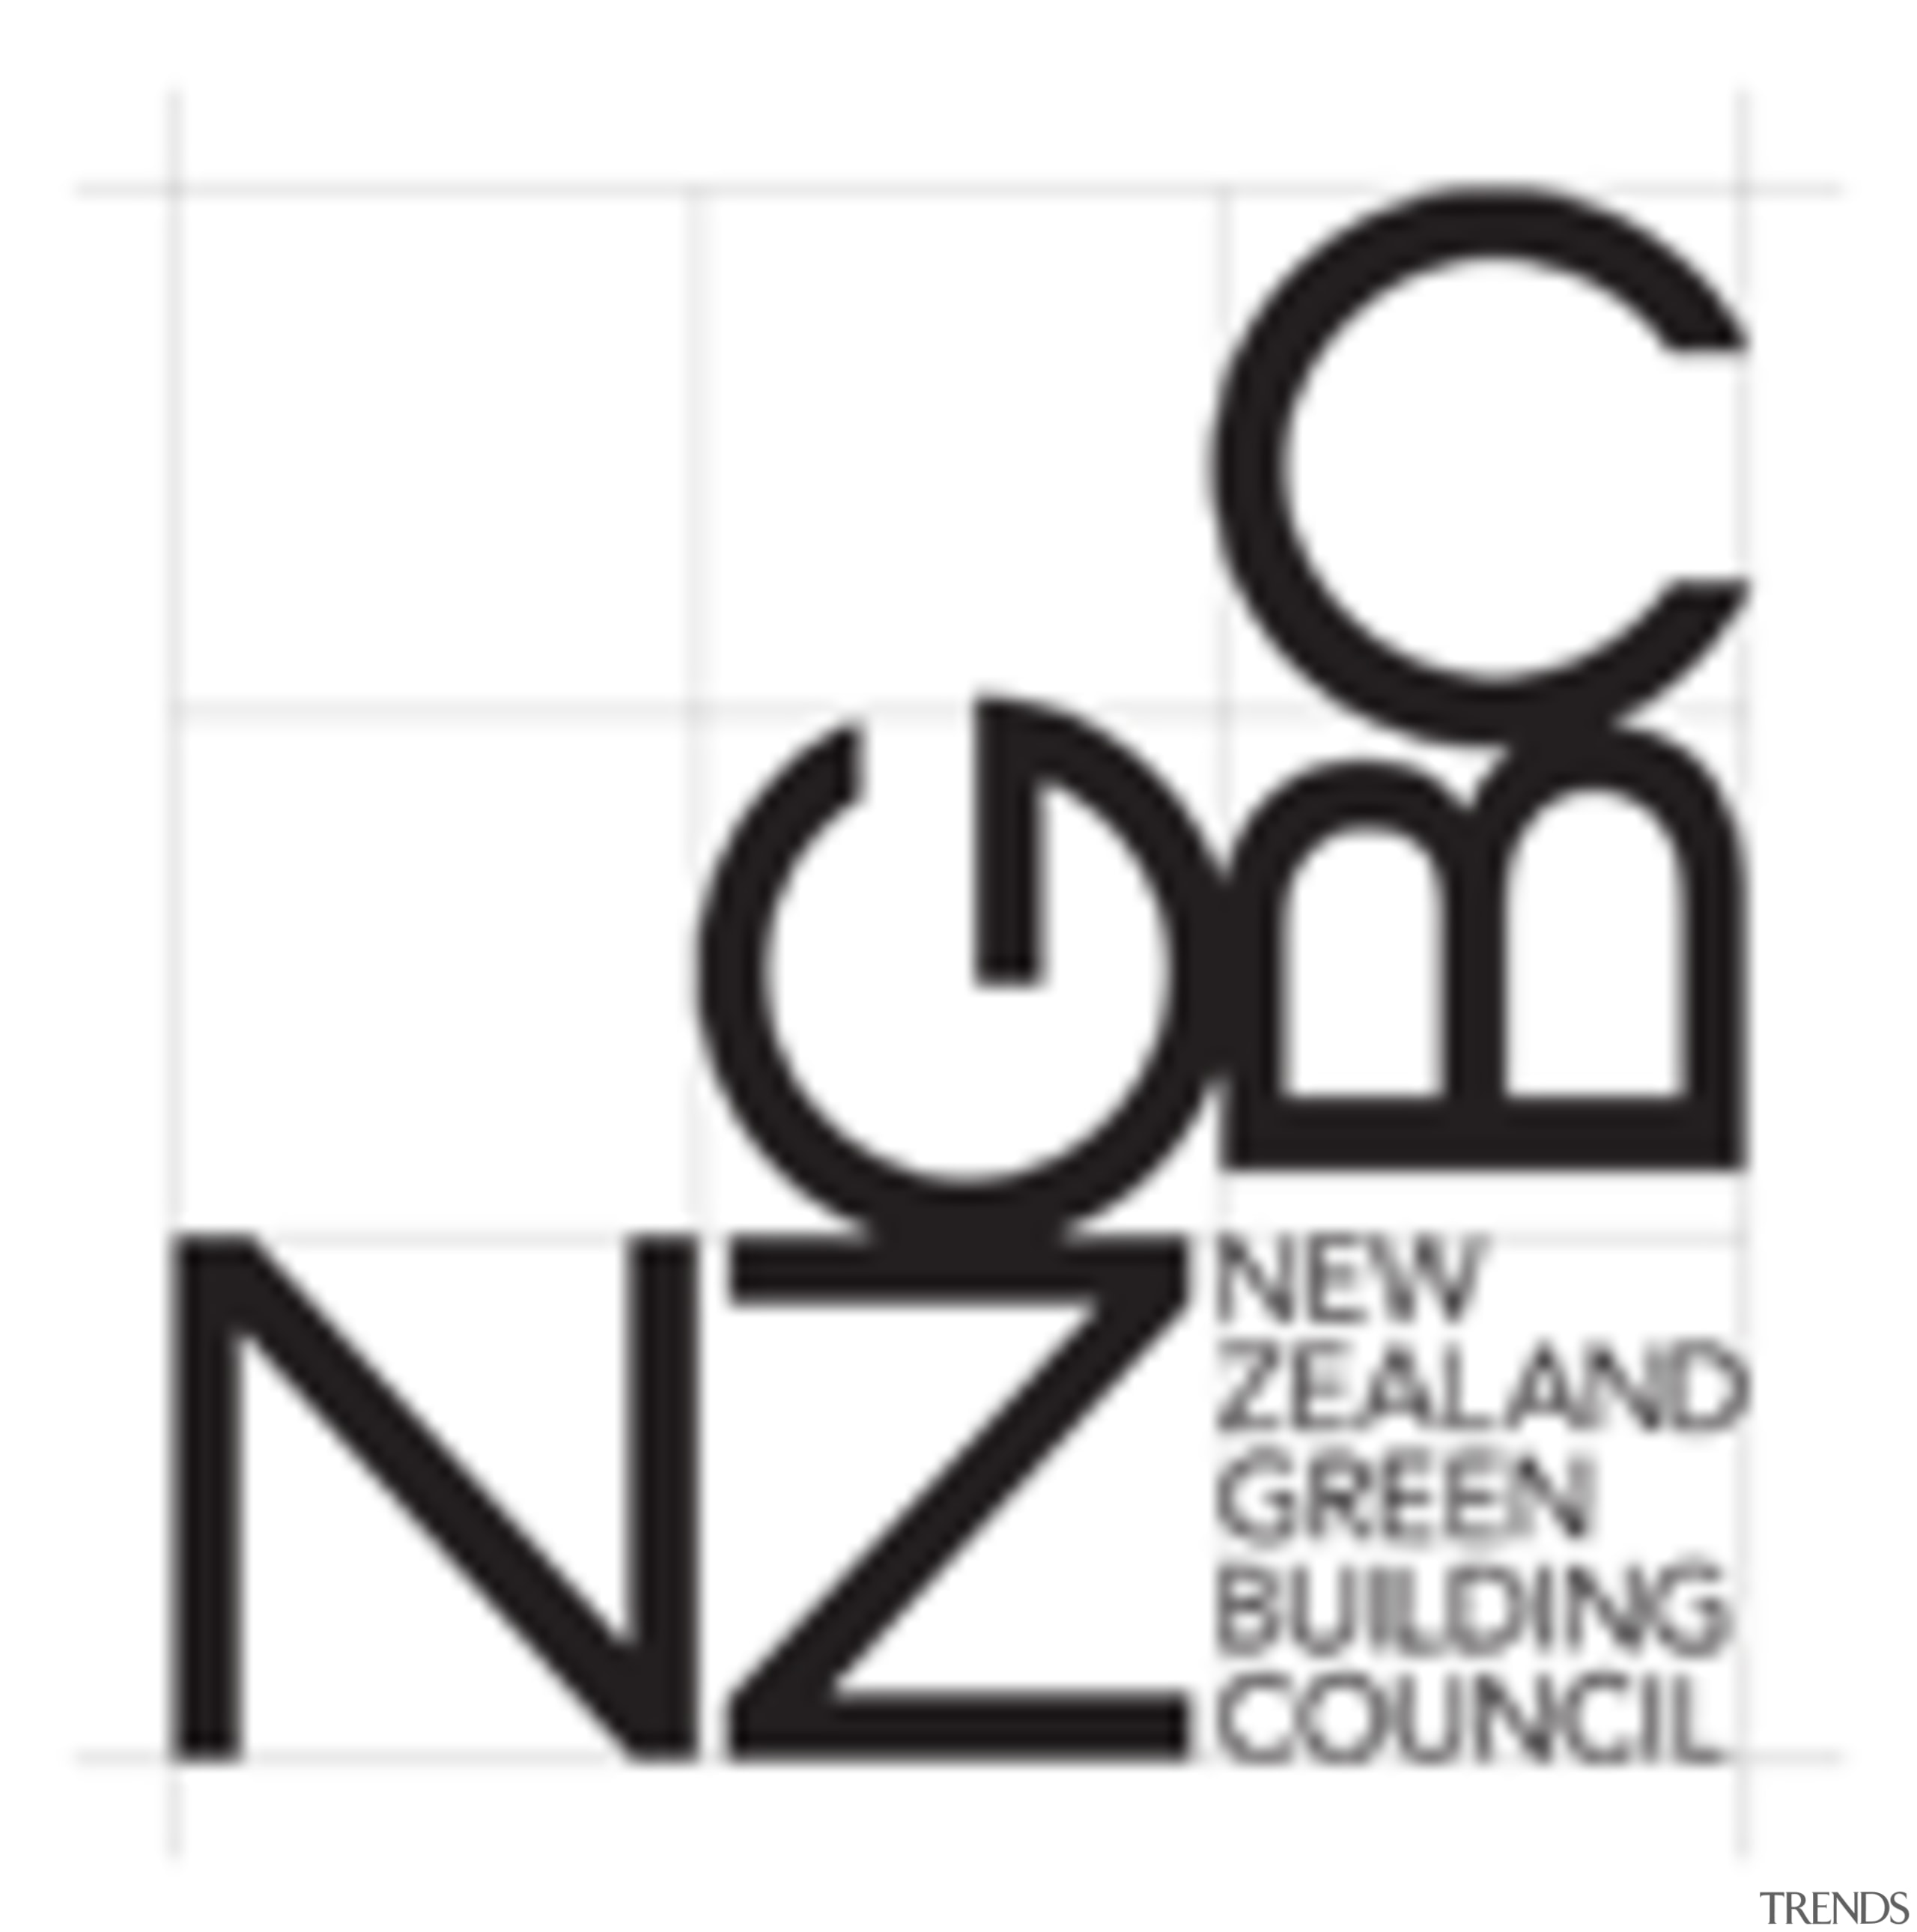 Nzgbclogo - font | line | text | font, line, text, white